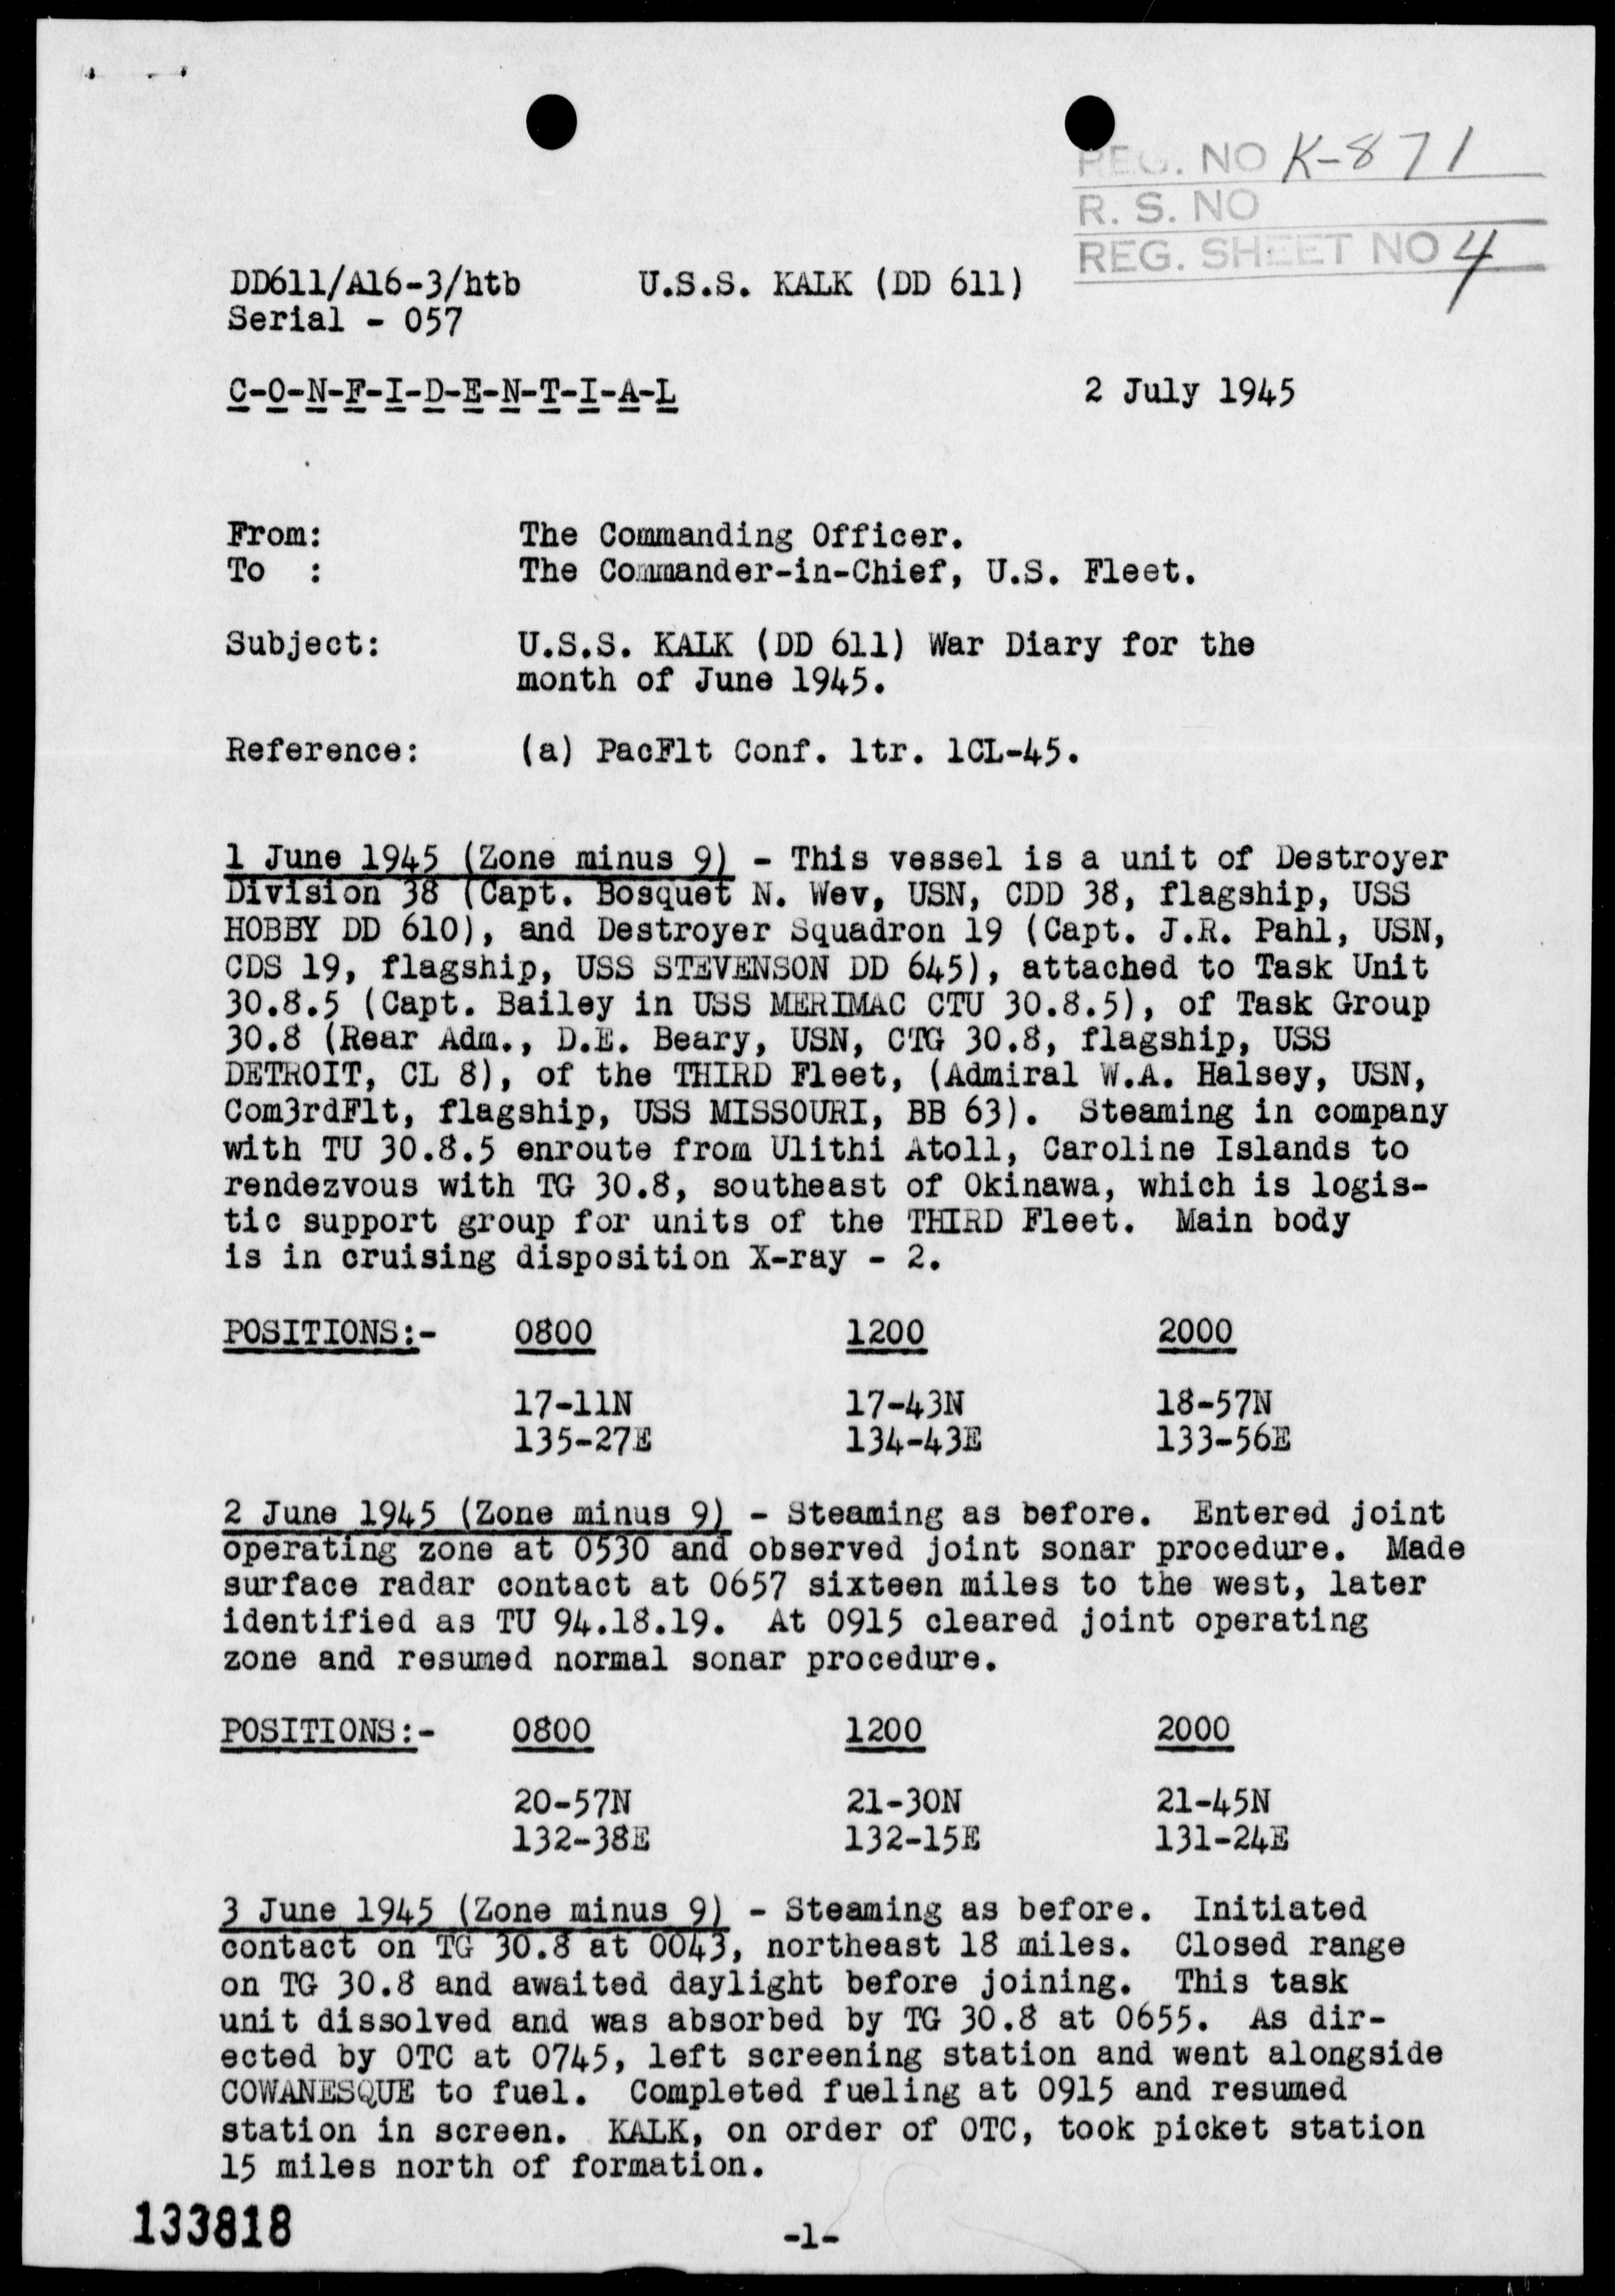 USS KALK - War Diary, 6/1-30/45